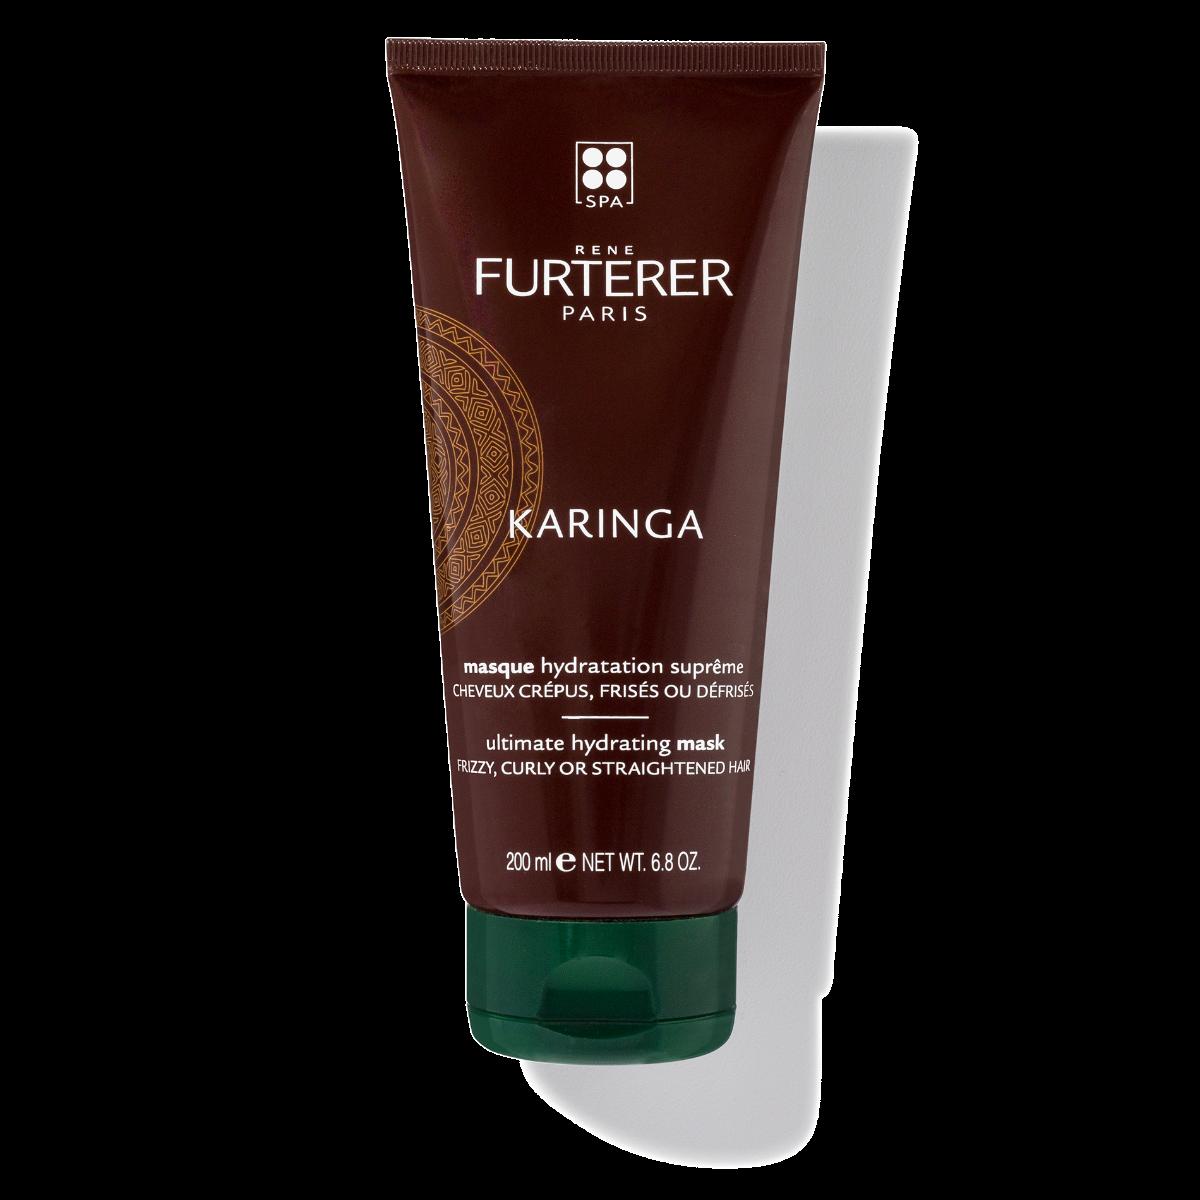 Rene Furterer KARINGA Ultimate Hydrating Mask